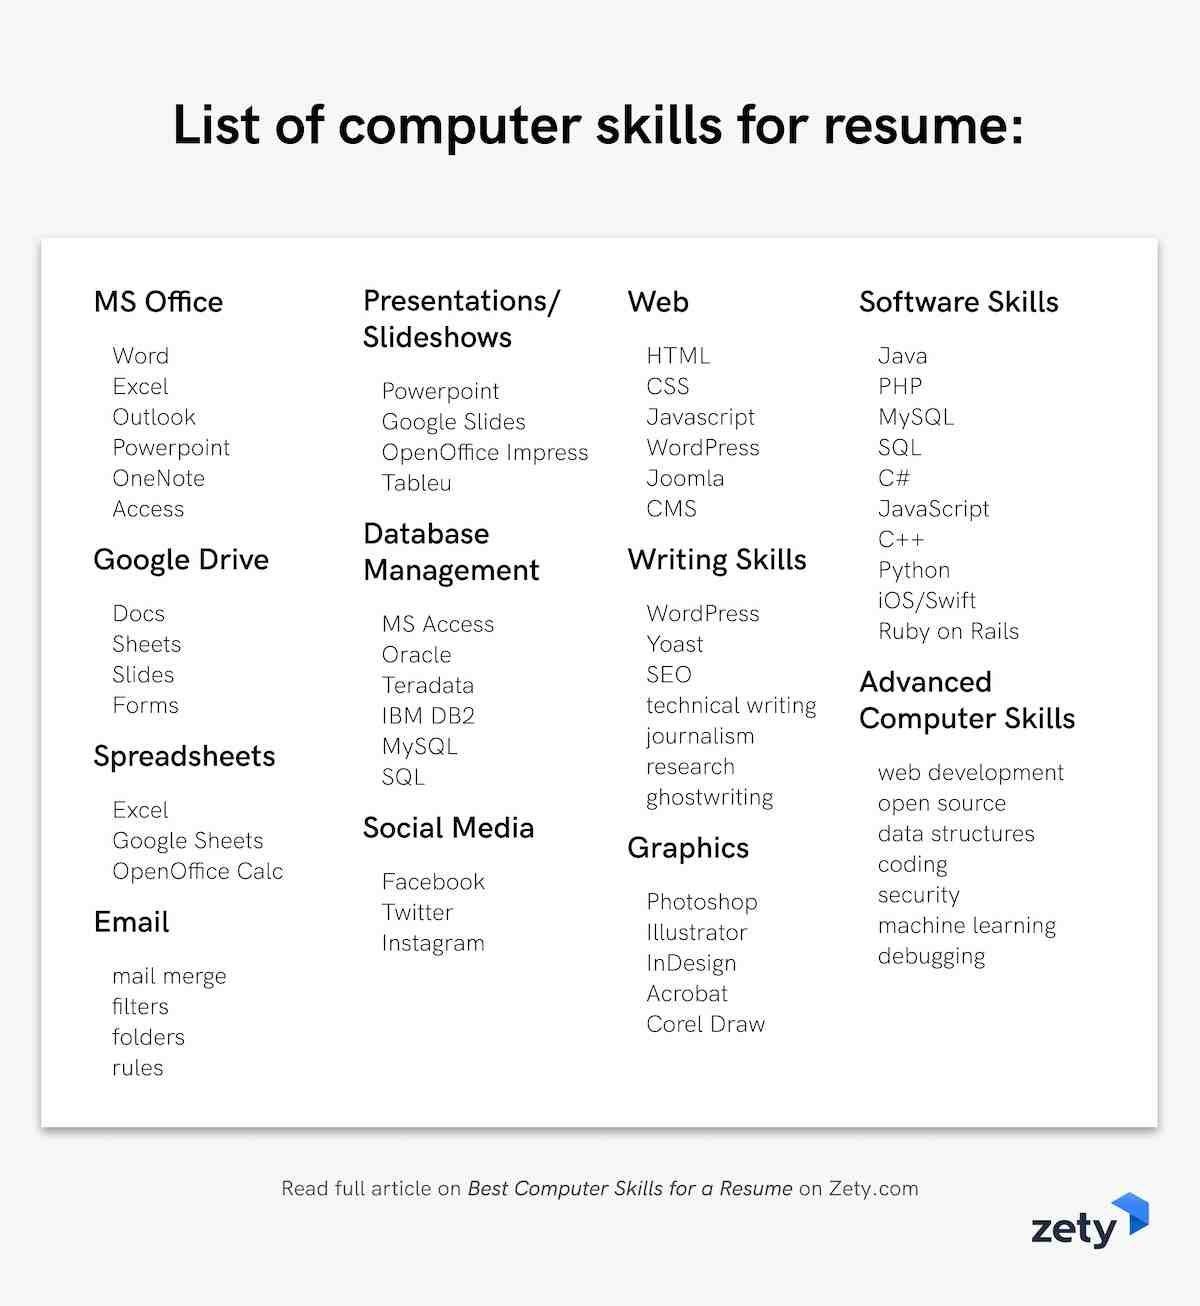 List Of Computer Skills Resume Sample top Computer Skills for A Resume: Ready software List